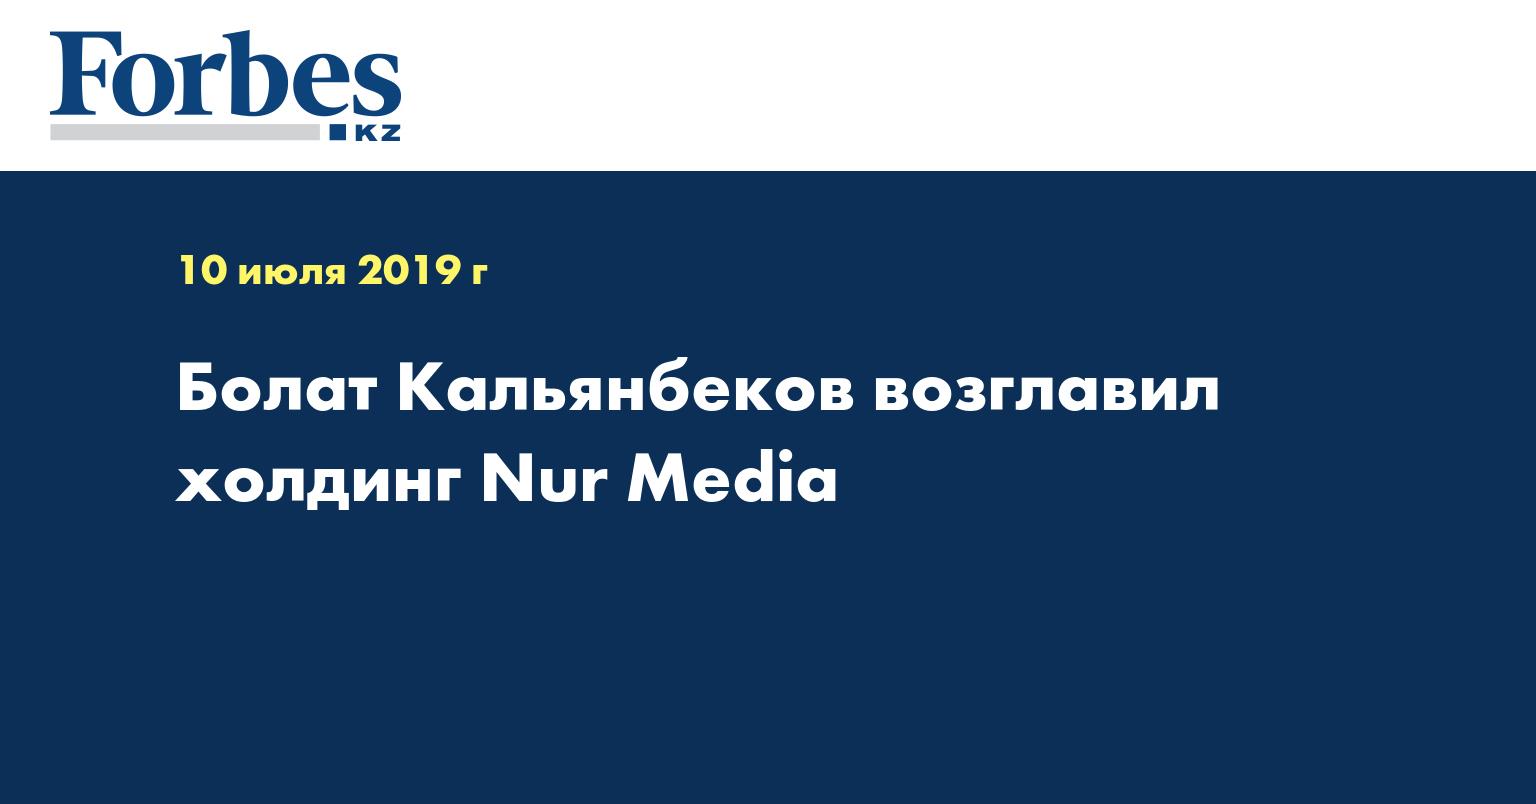 Болат Кальянбеков возглавил холдинг Nur Media